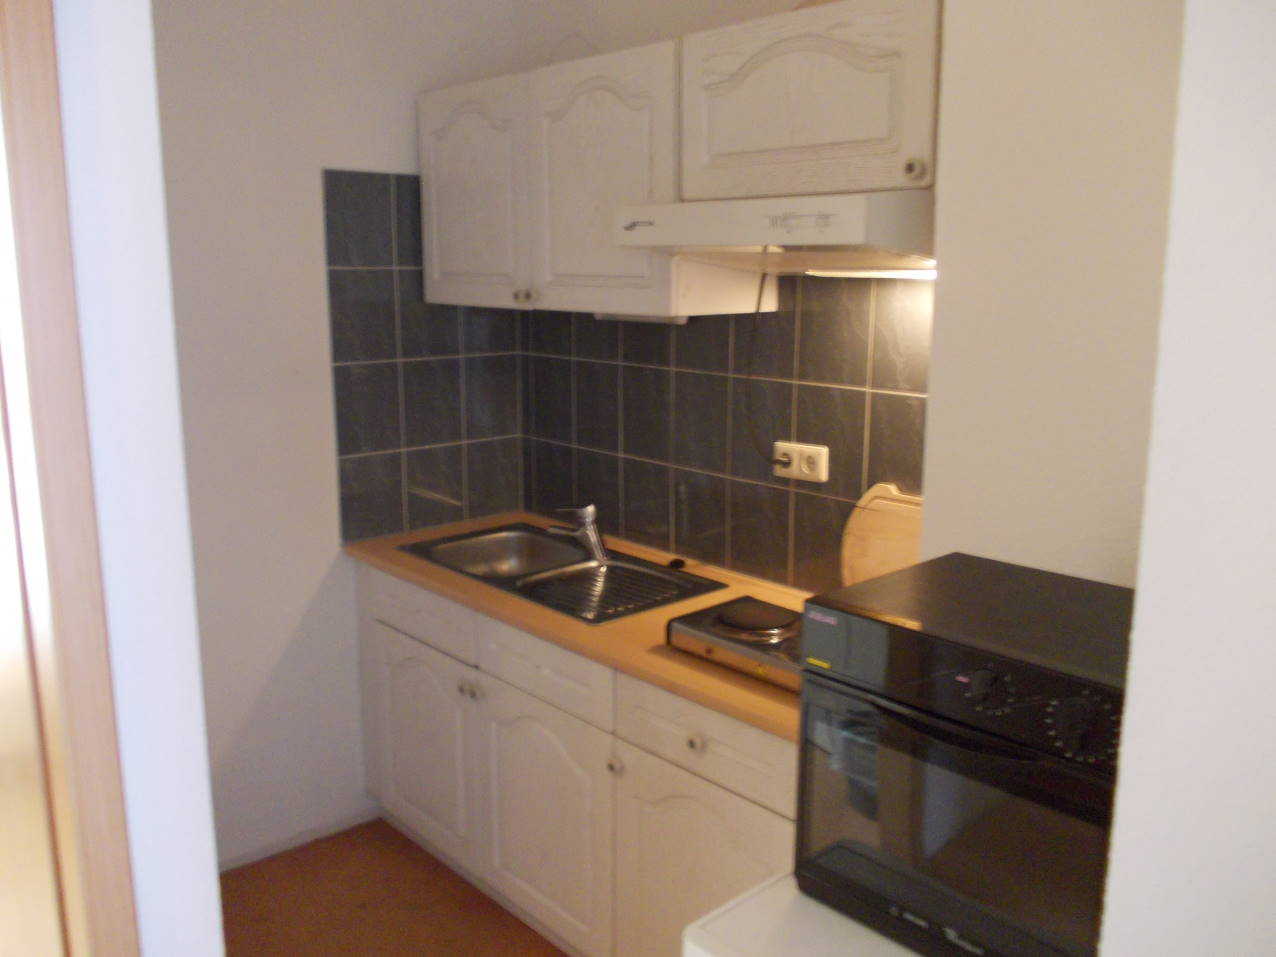 5-bett-appartement-mit-kueche4